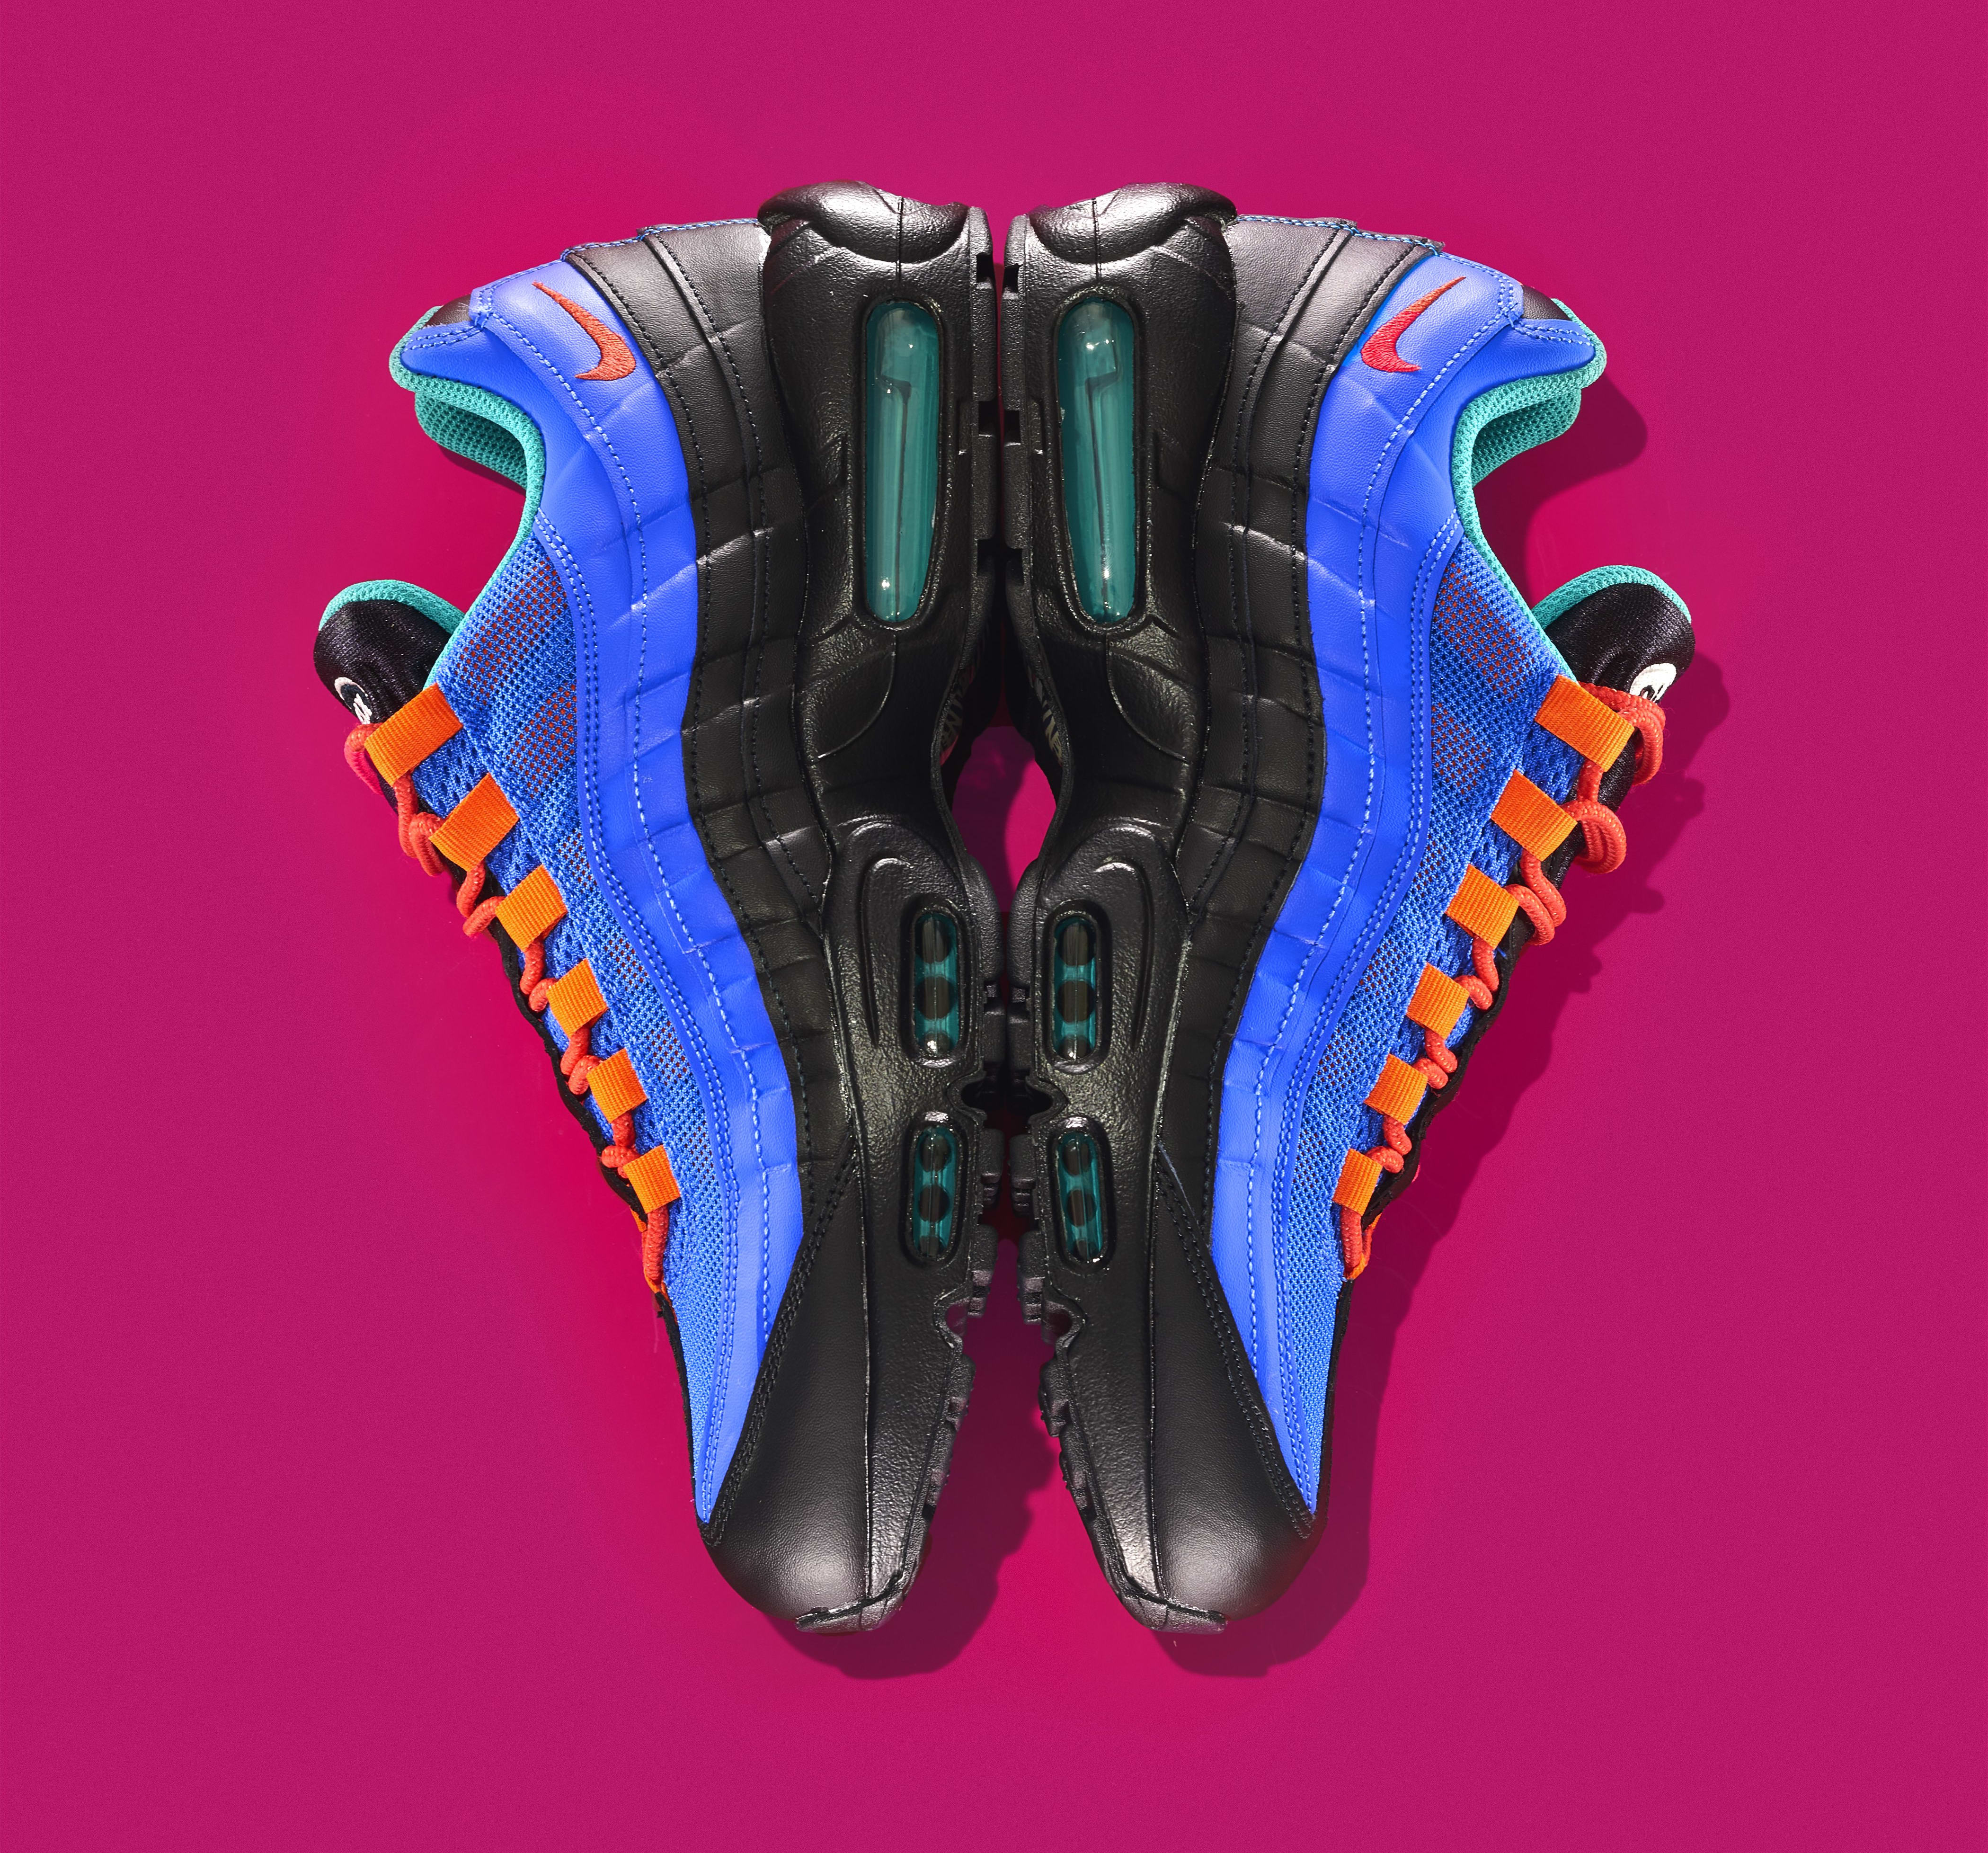 Coral Studios x Nike Air Max 95 V2